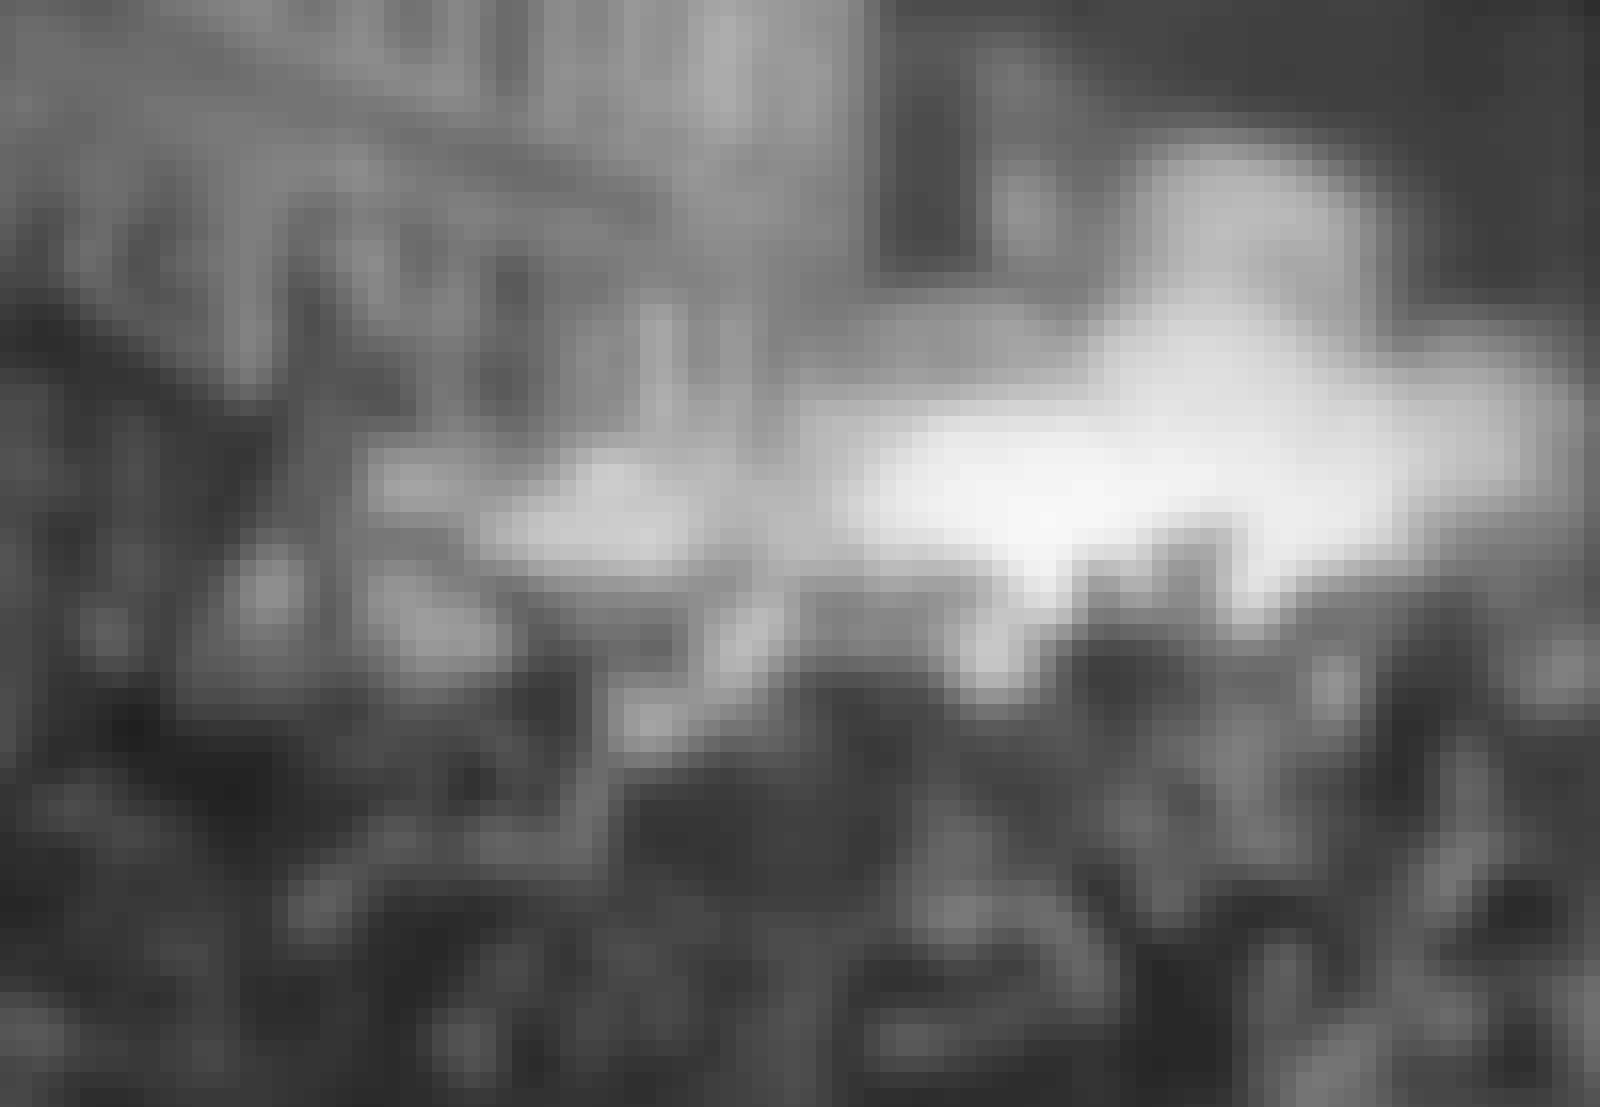 1. maj arbejdernes internationale kampdag haymarket bombe